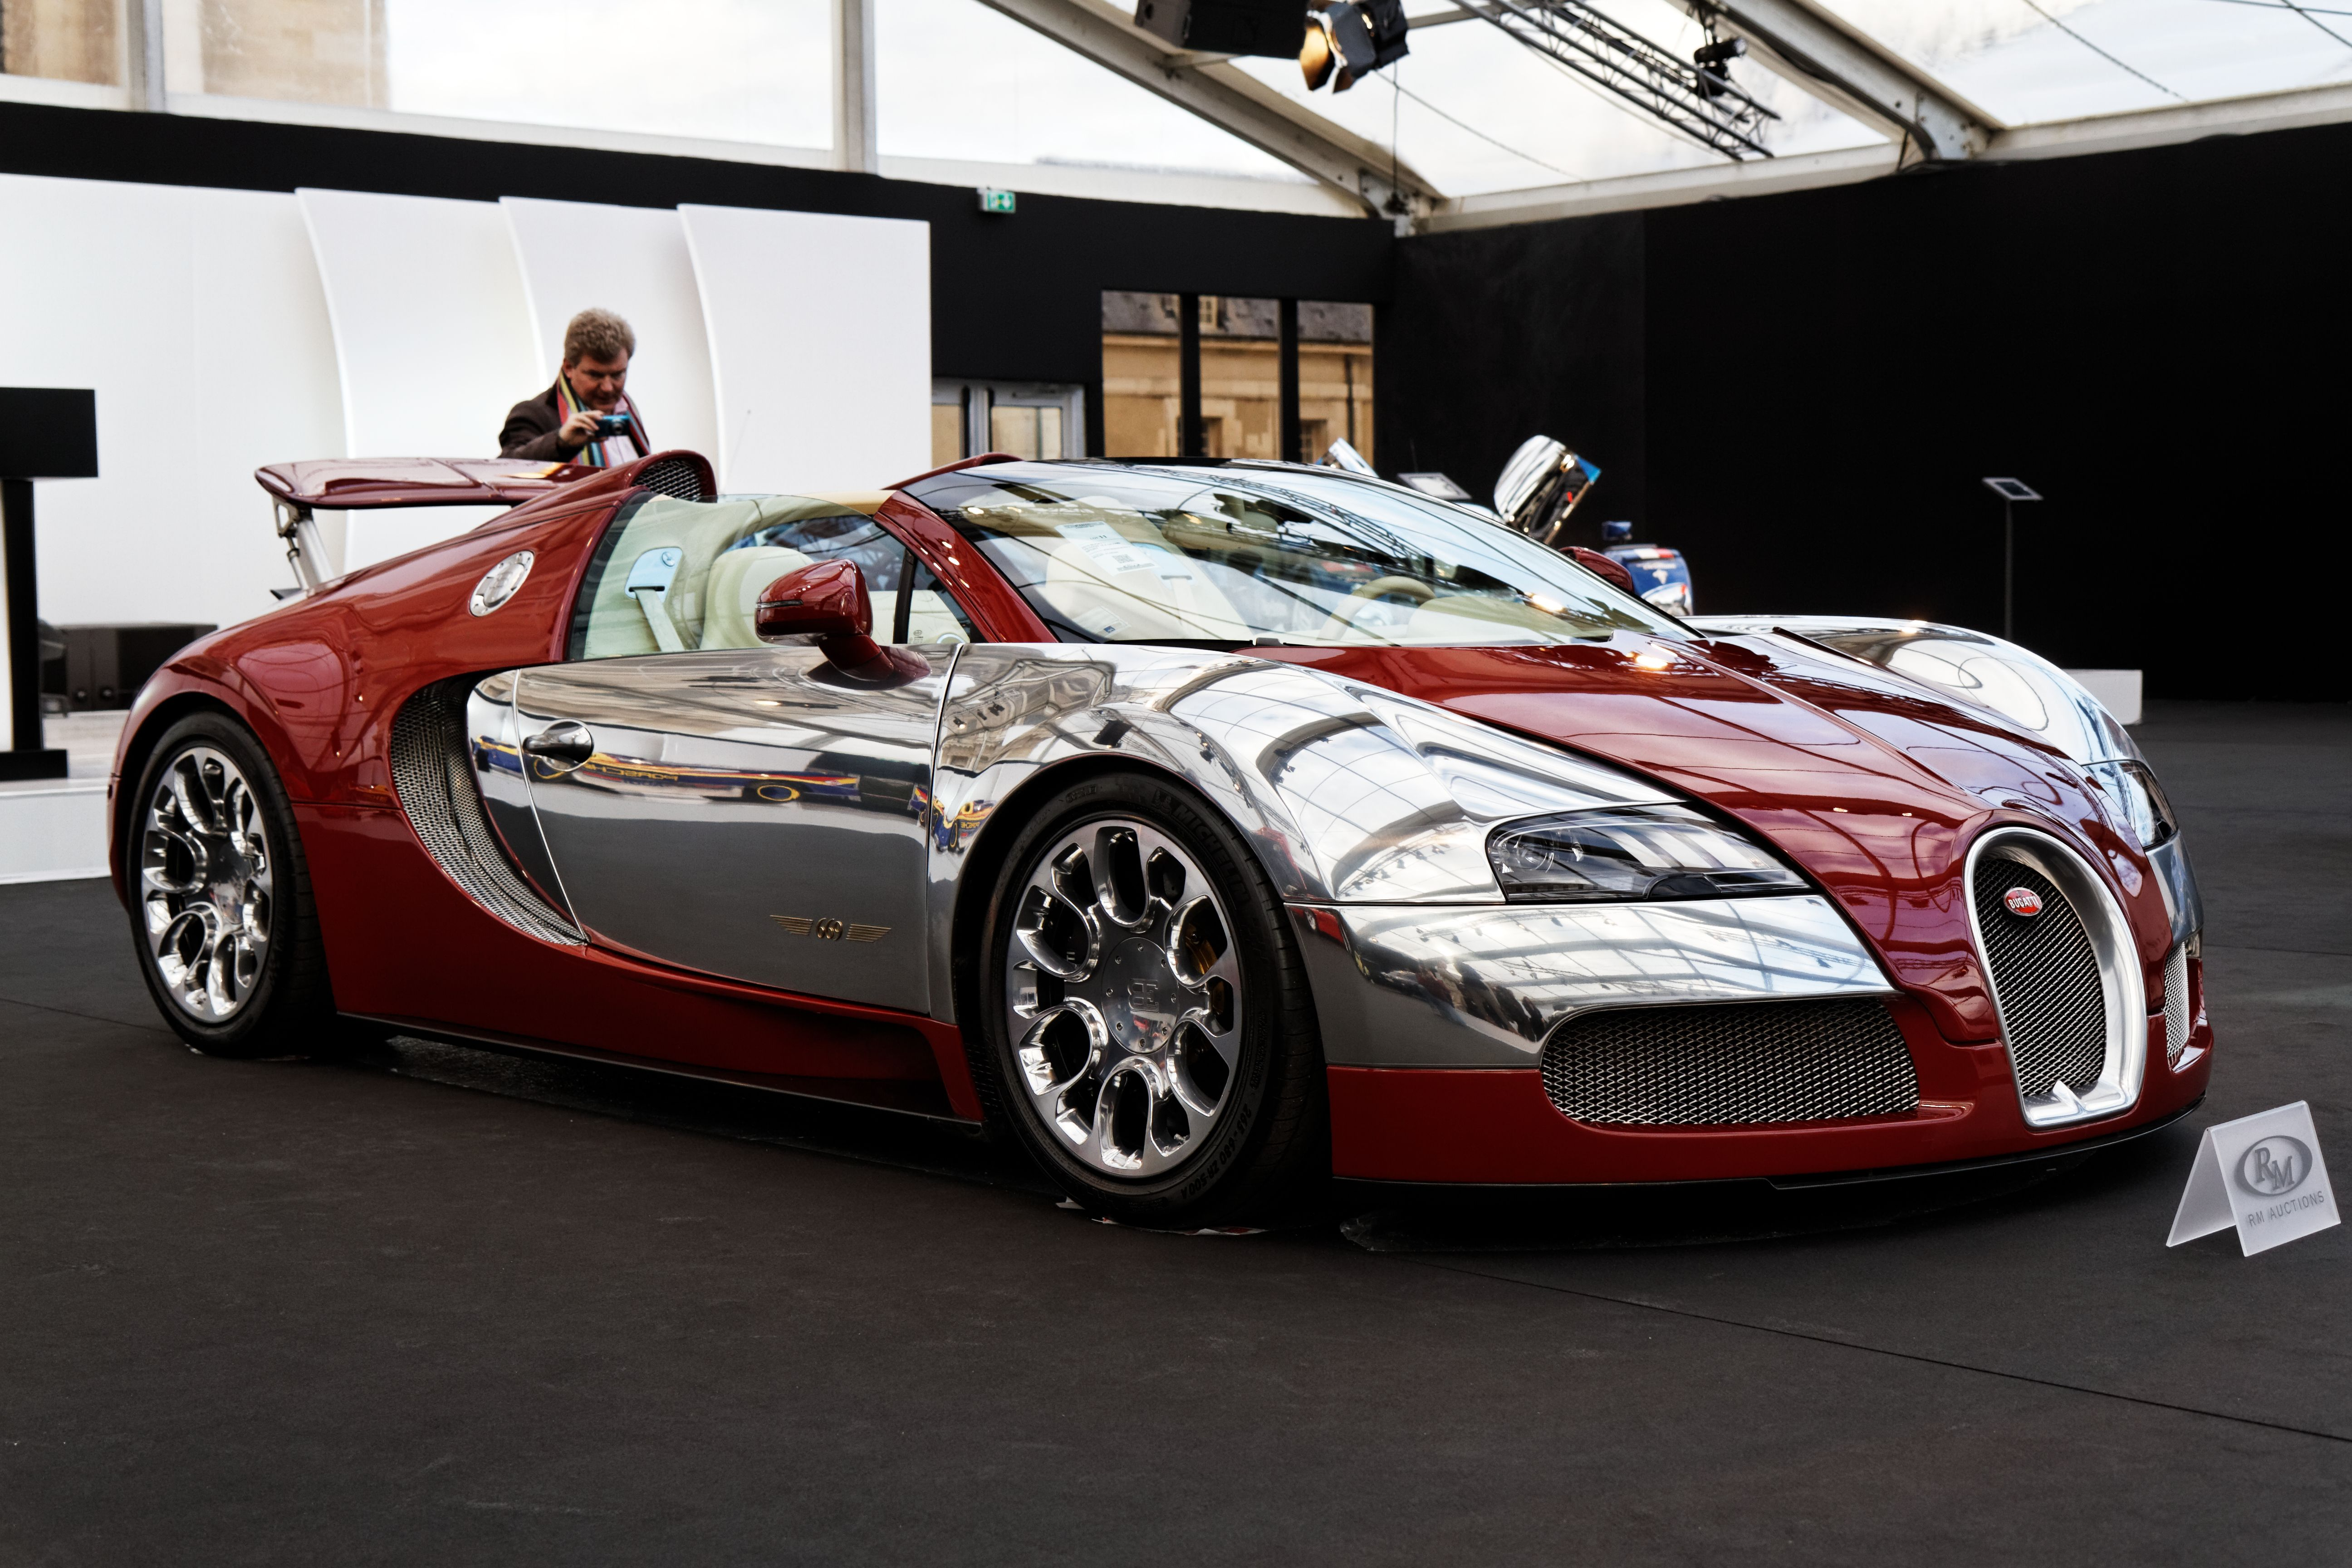 71f06cf500f38ca45ad50982e87b5fb7 Interesting Bugatti Veyron Grand Sport Vitesse Vs Pagani Huayra Cars Trend